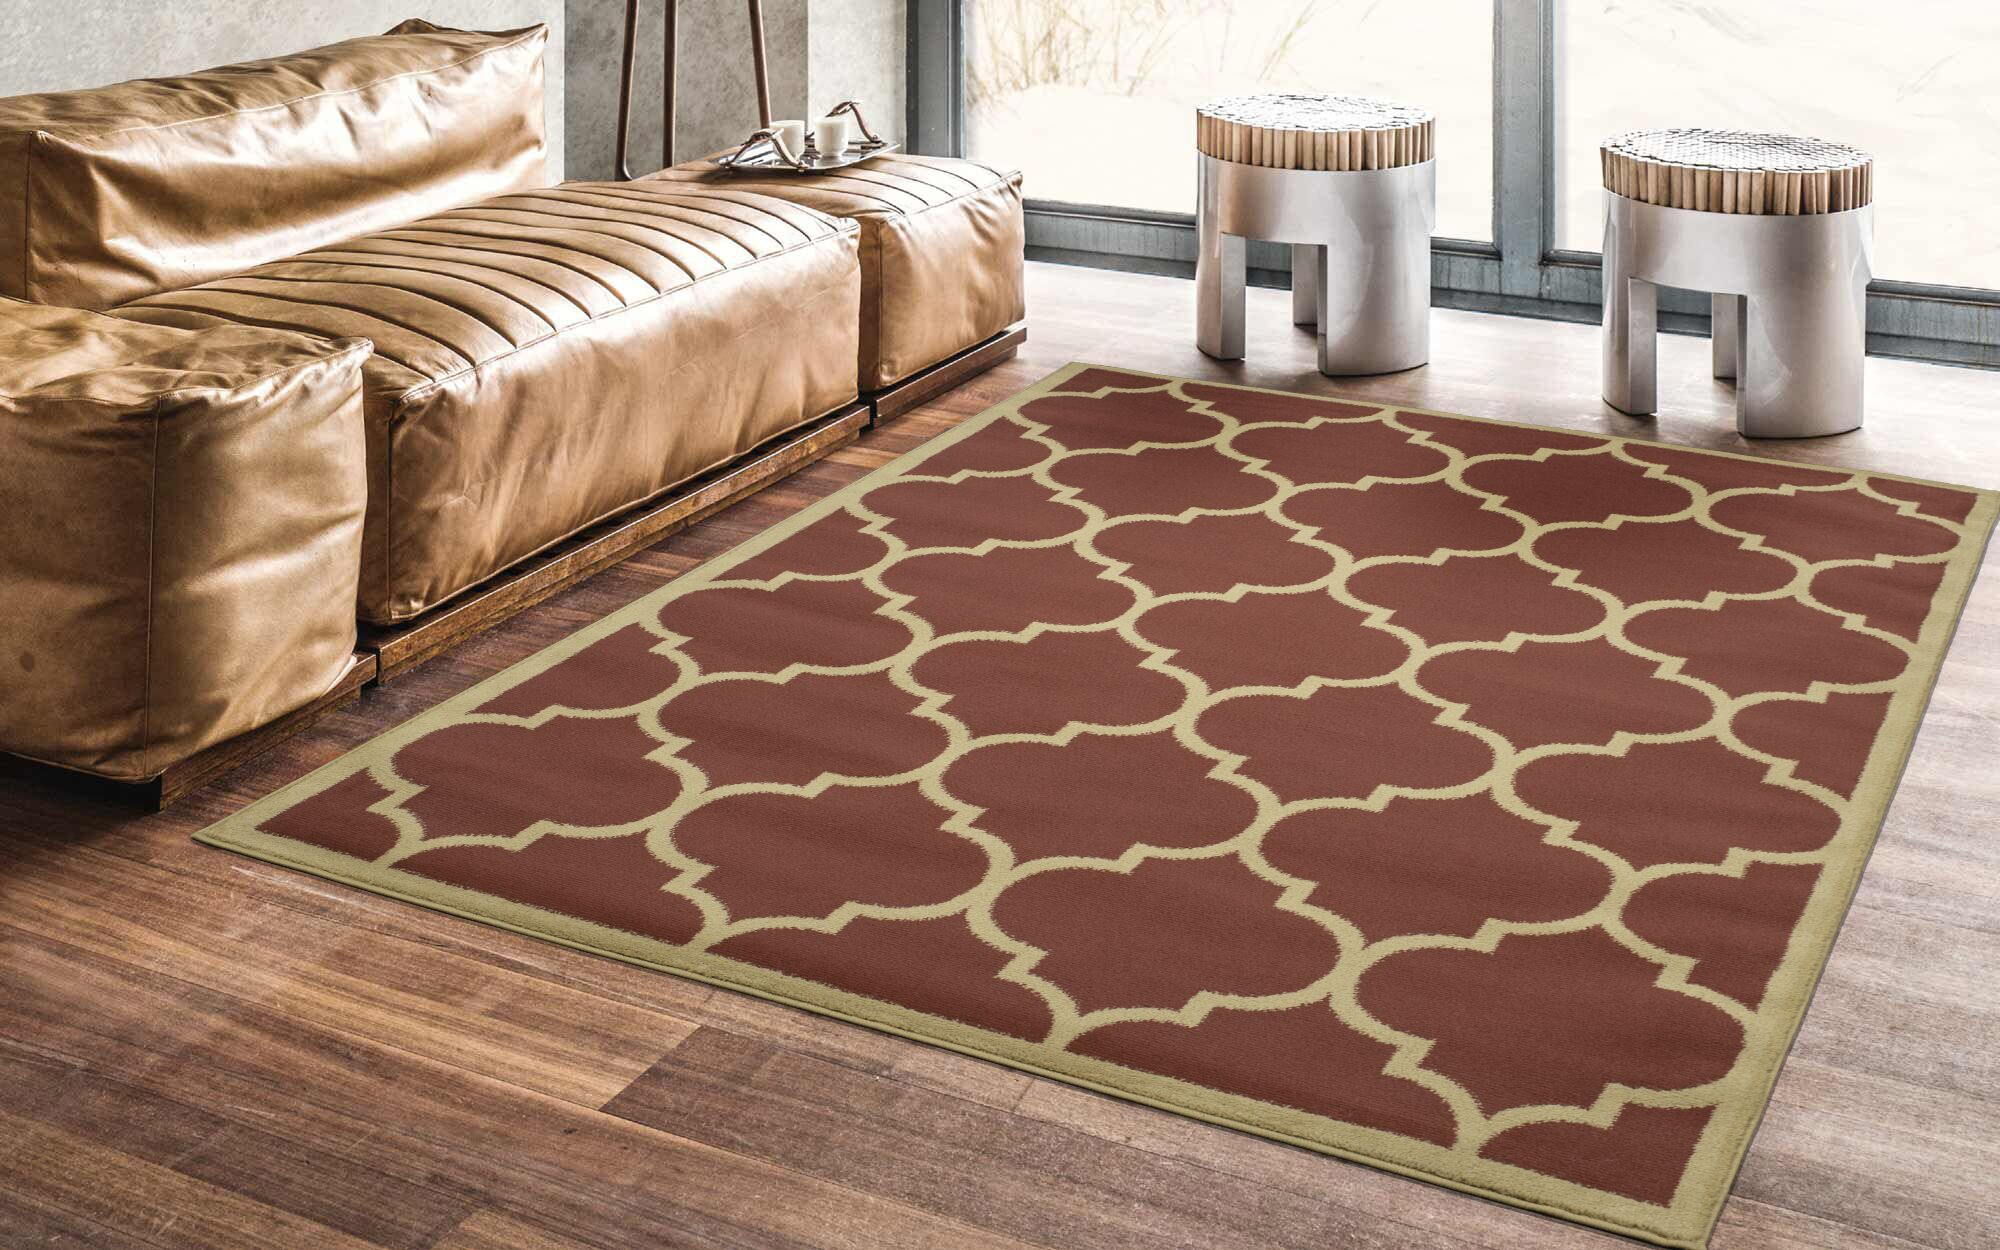 Hoehn Contemporary Moroccan Trellis Design Lattice Terracotta Area Rug Rug Size: Rectangle 7'10